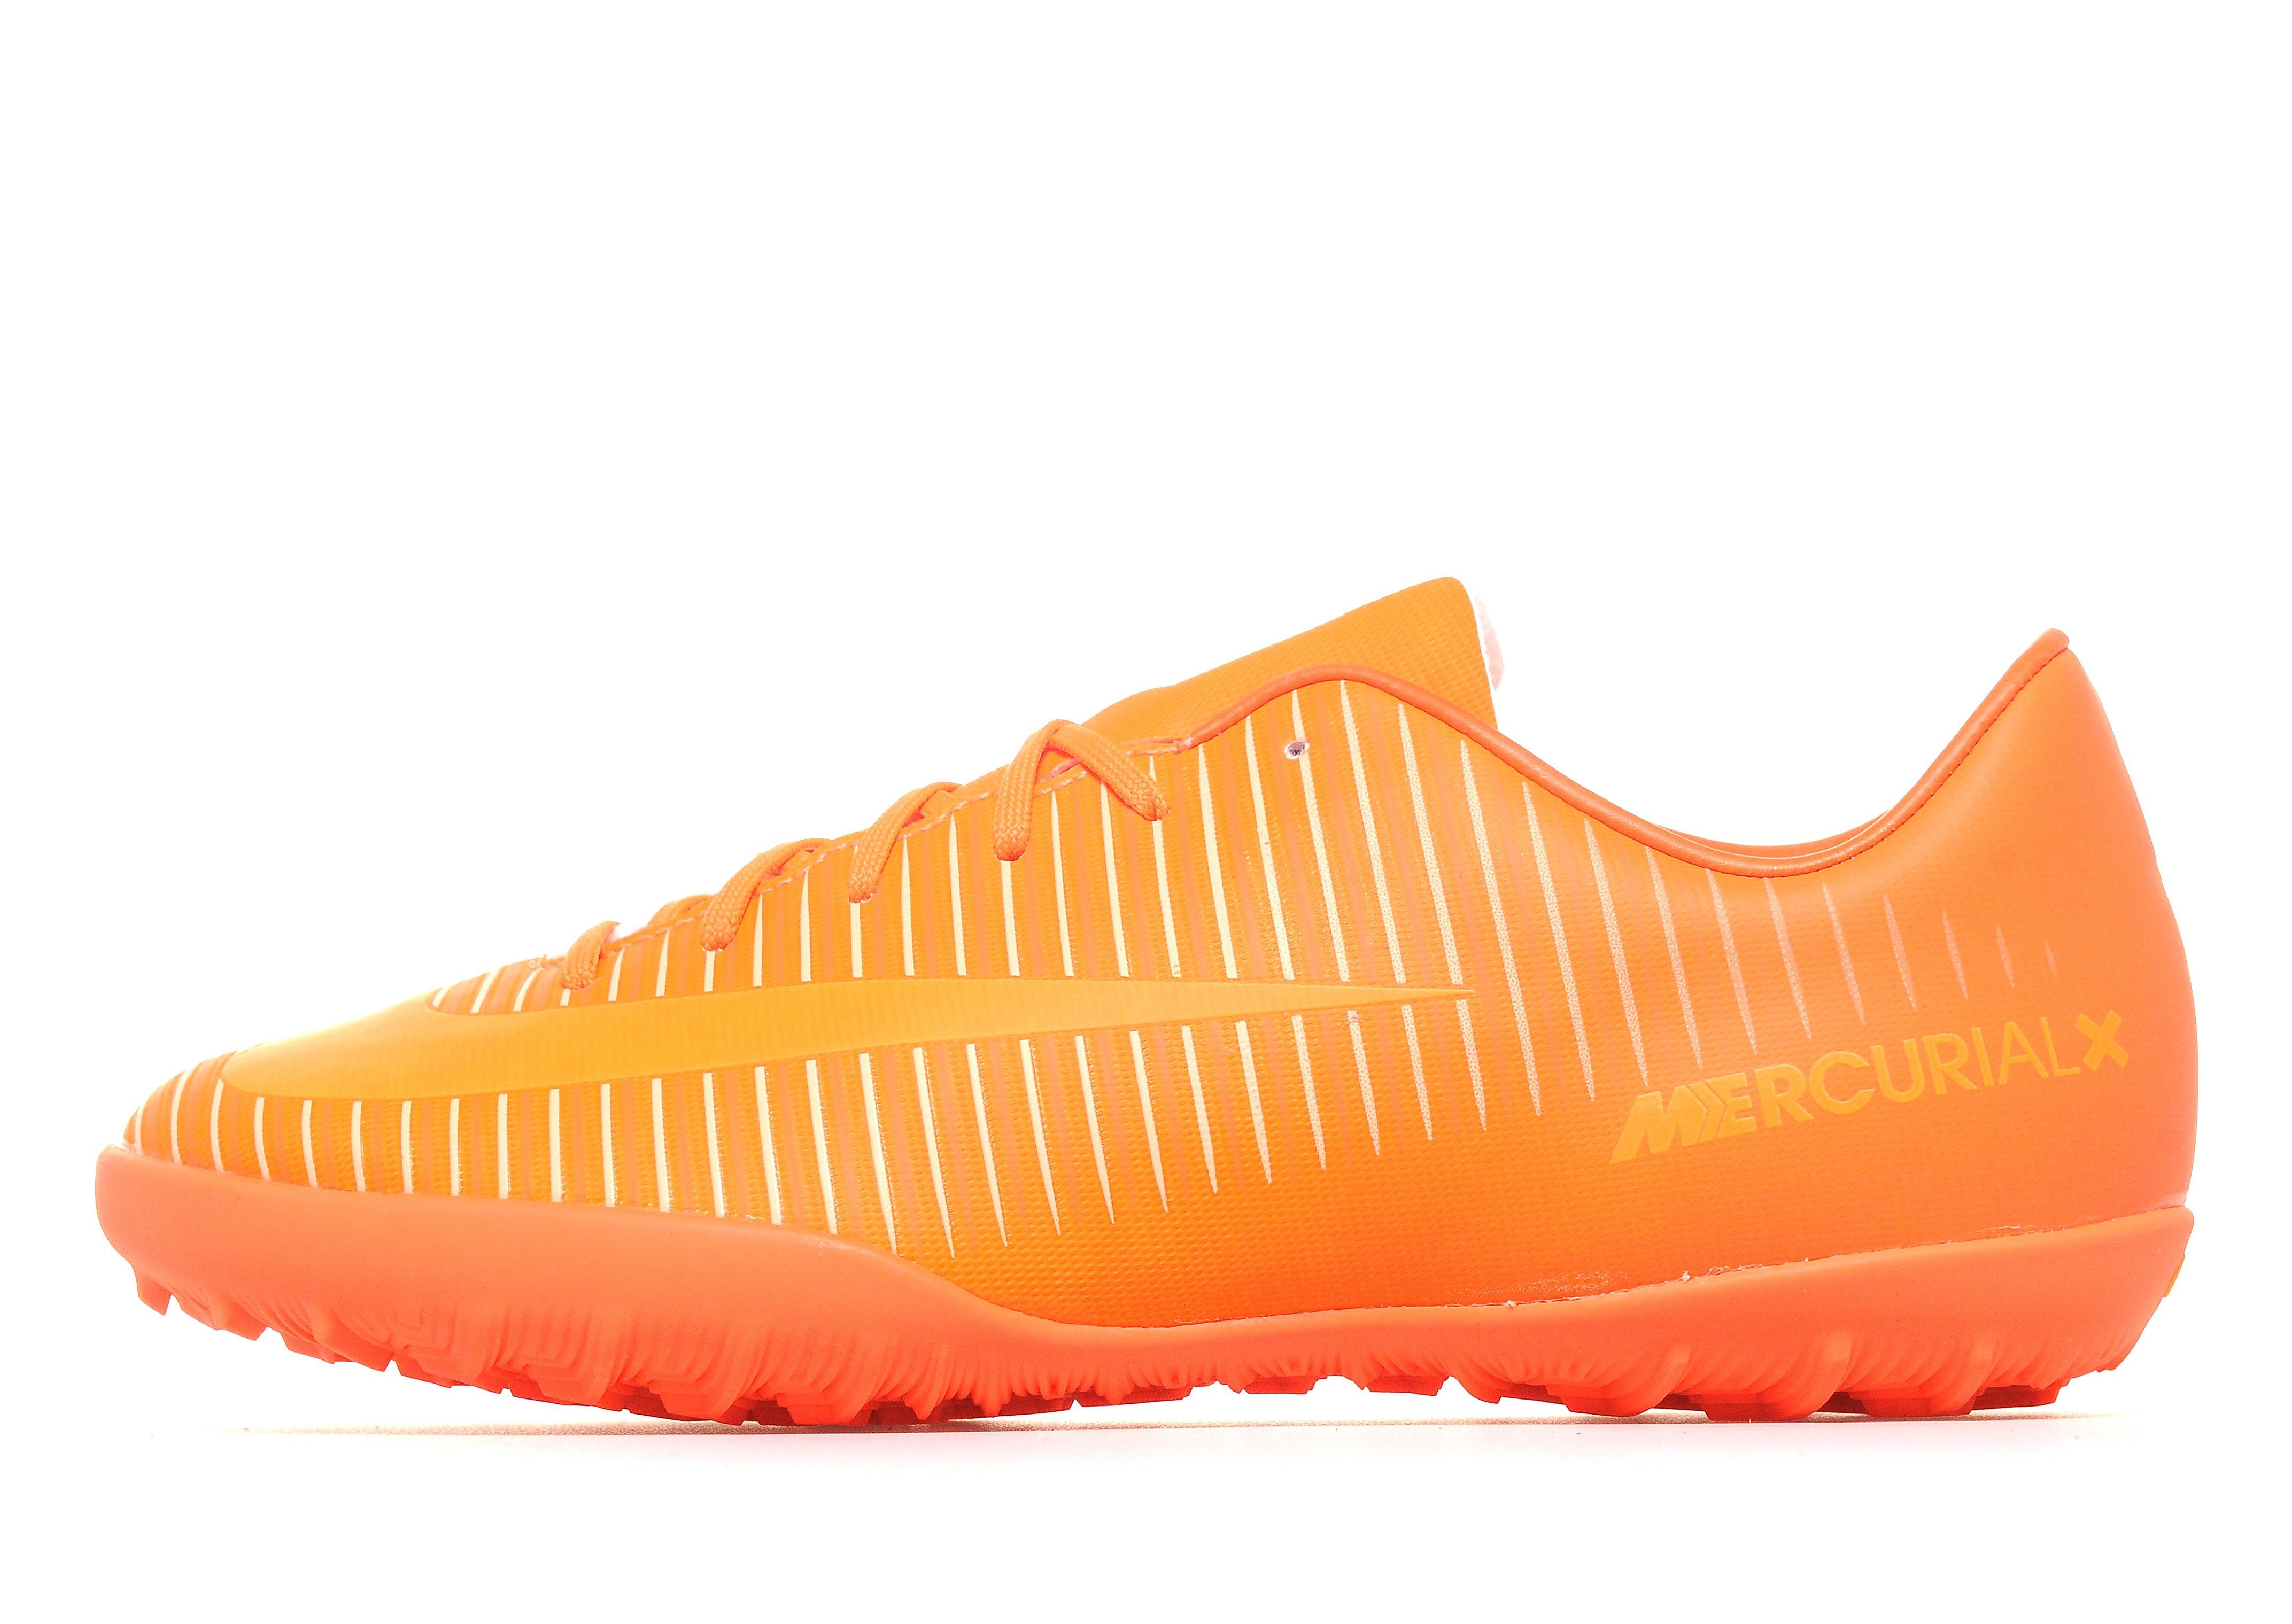 Nike Football X Glow Mercurial Victory VI Turf Junior